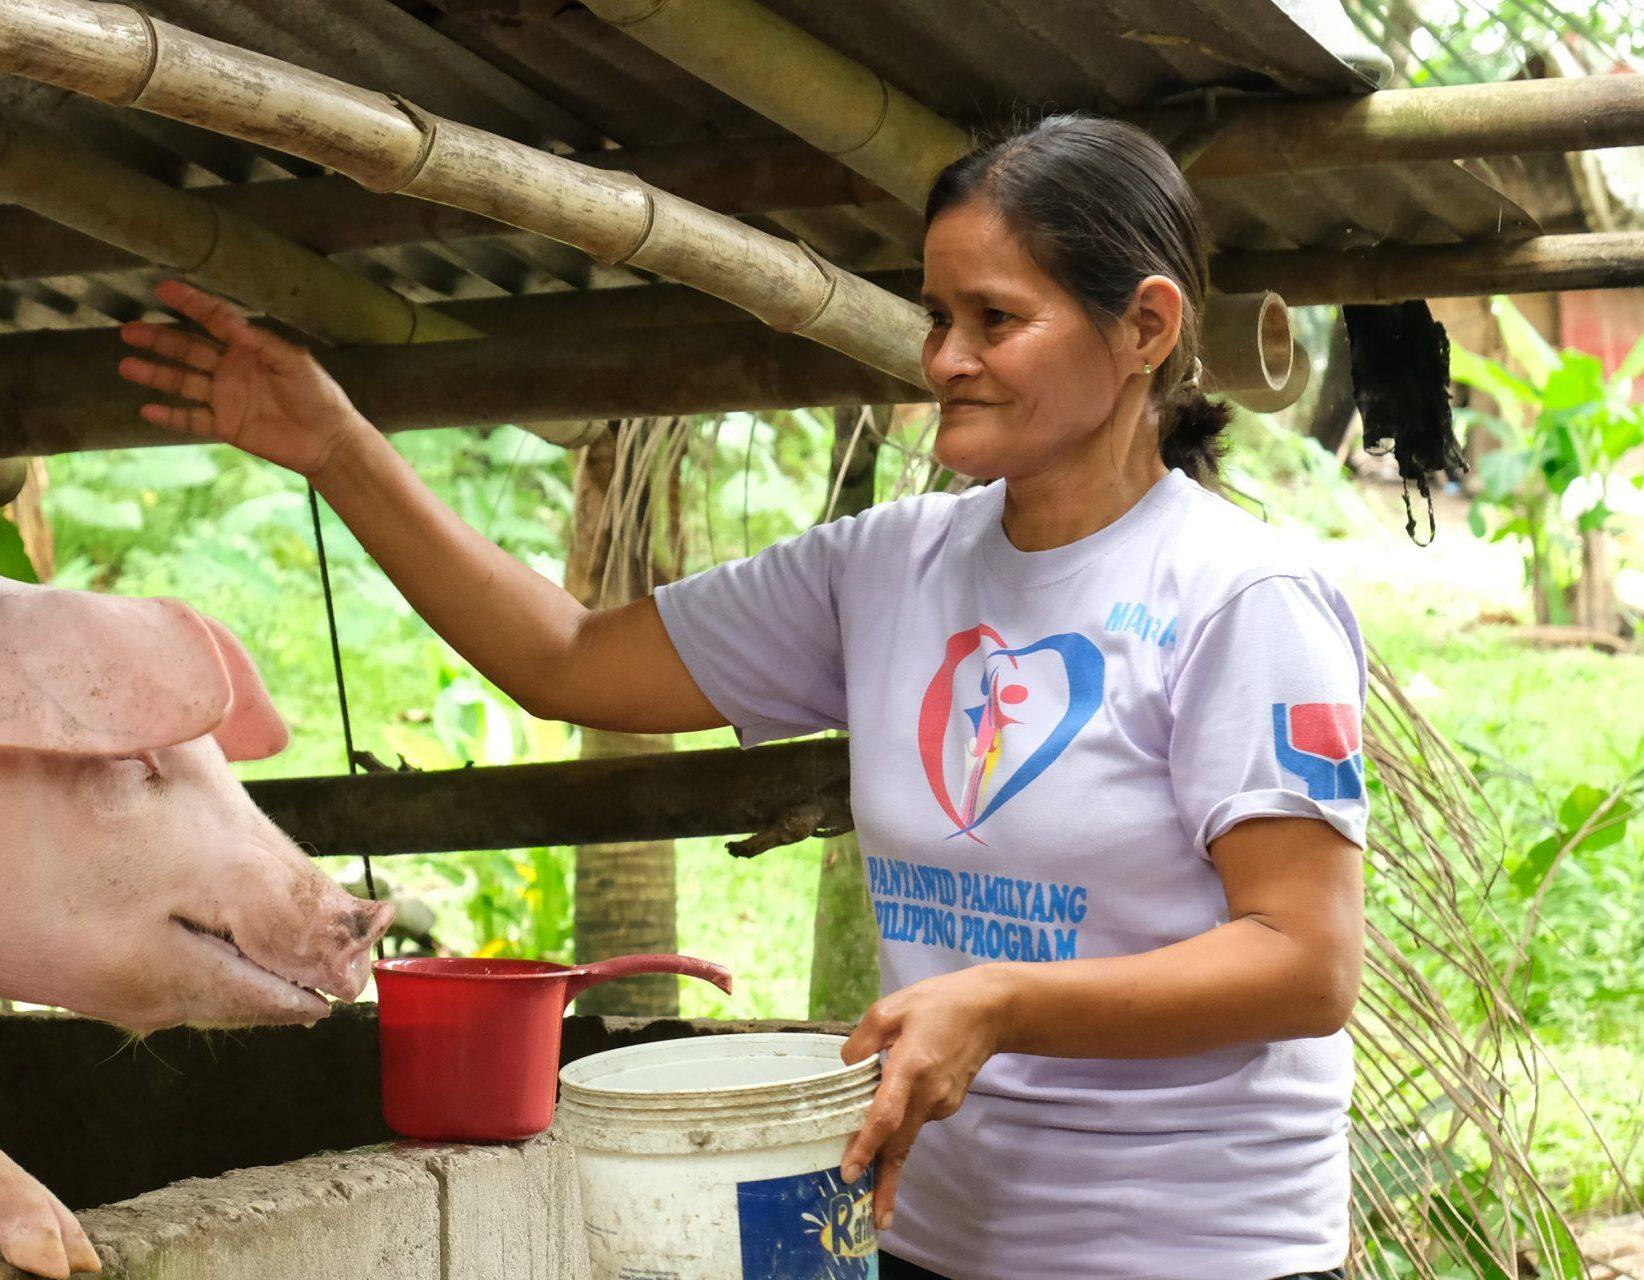 Corazon feeding a pig